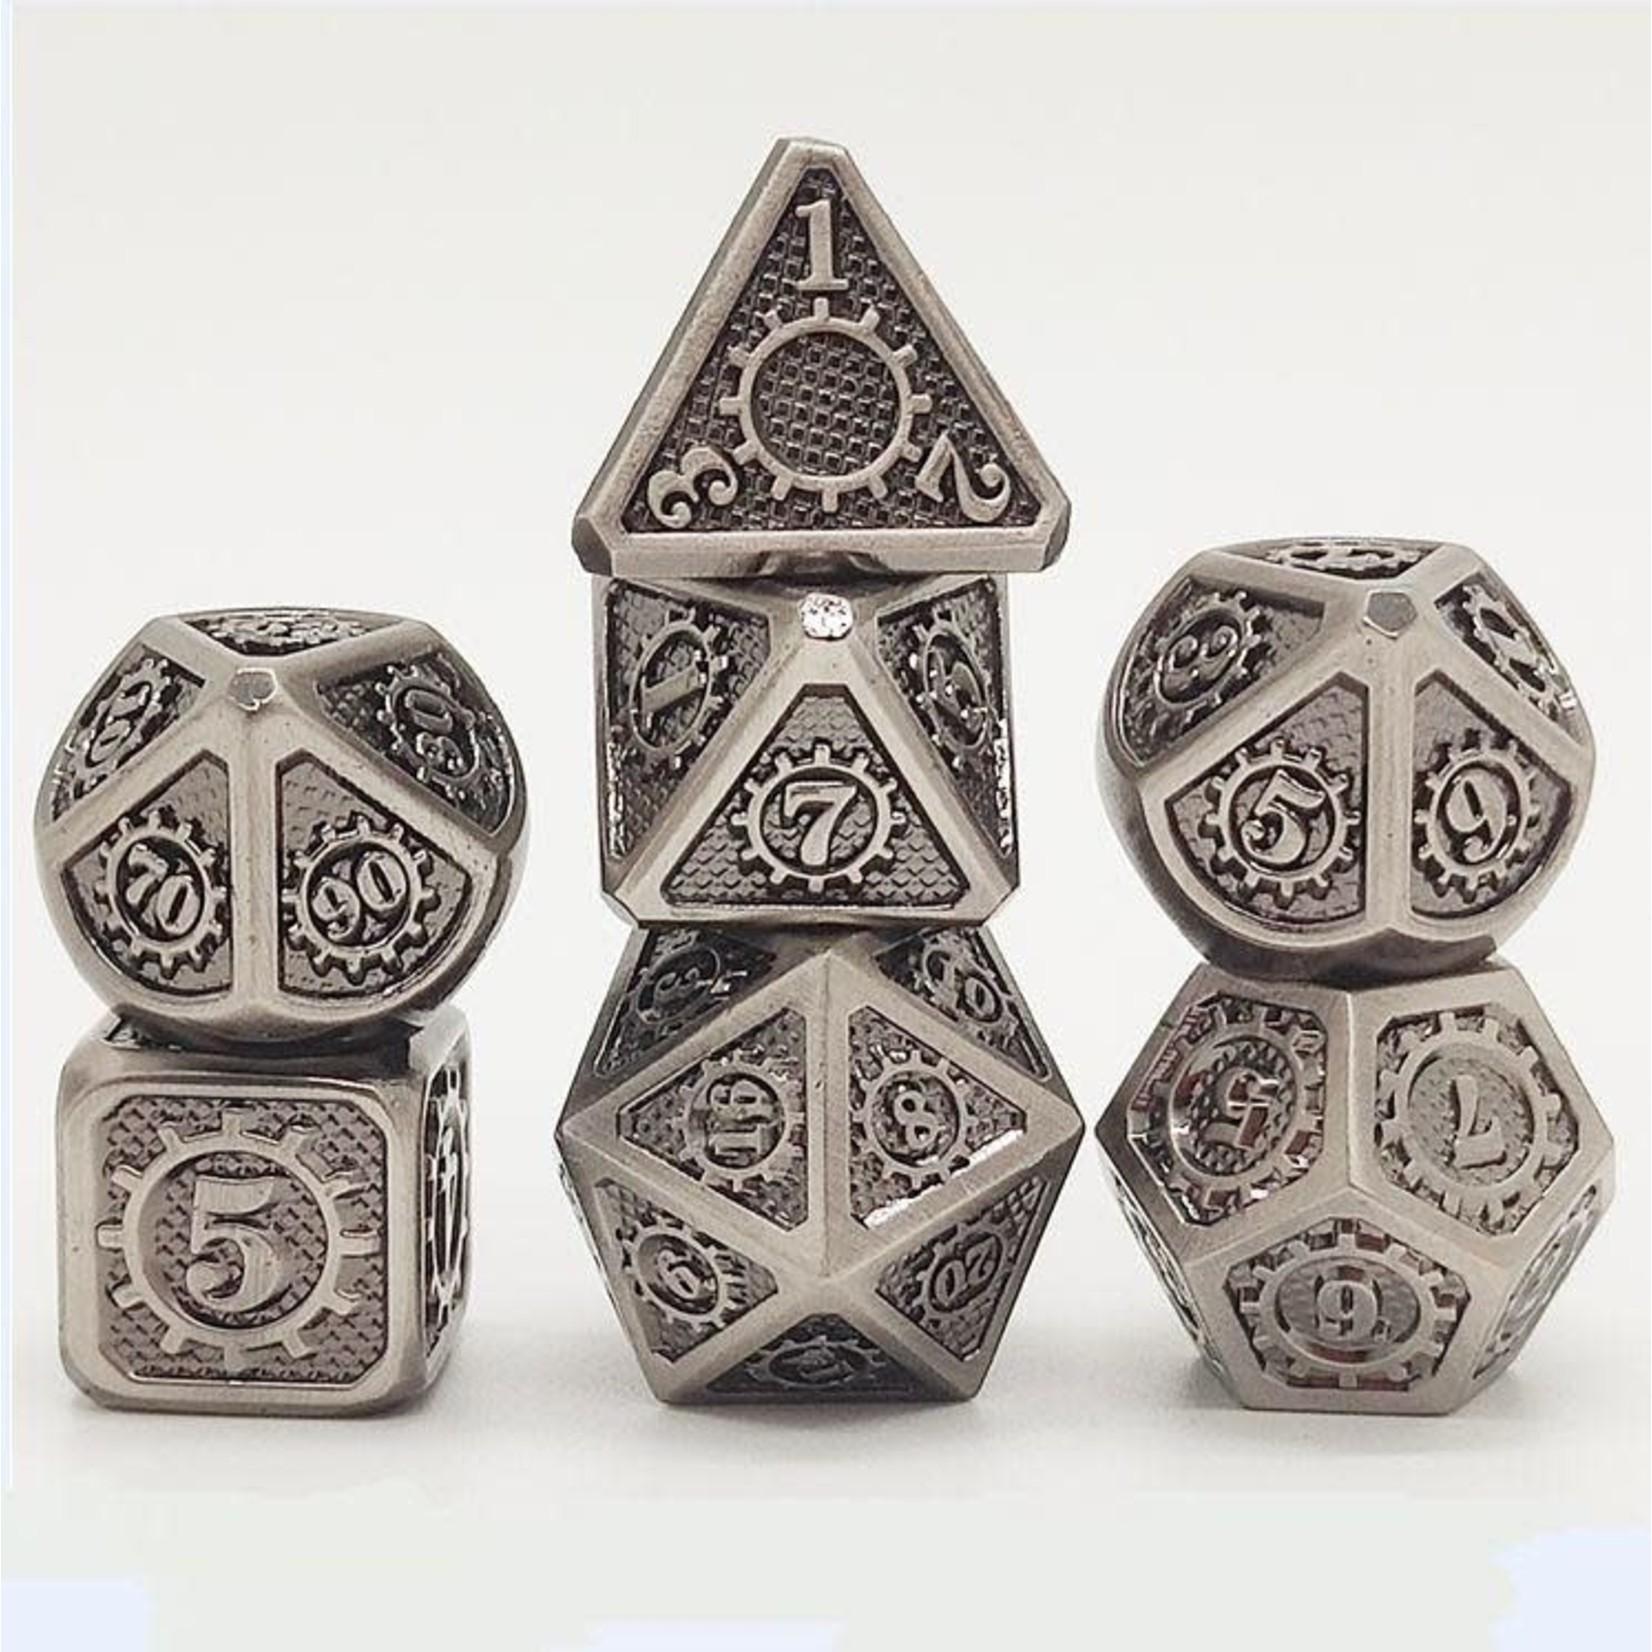 Hymgho Dice US Hymgho 7-Set Gears of Providence Brushed Ancient Iron Dice Set